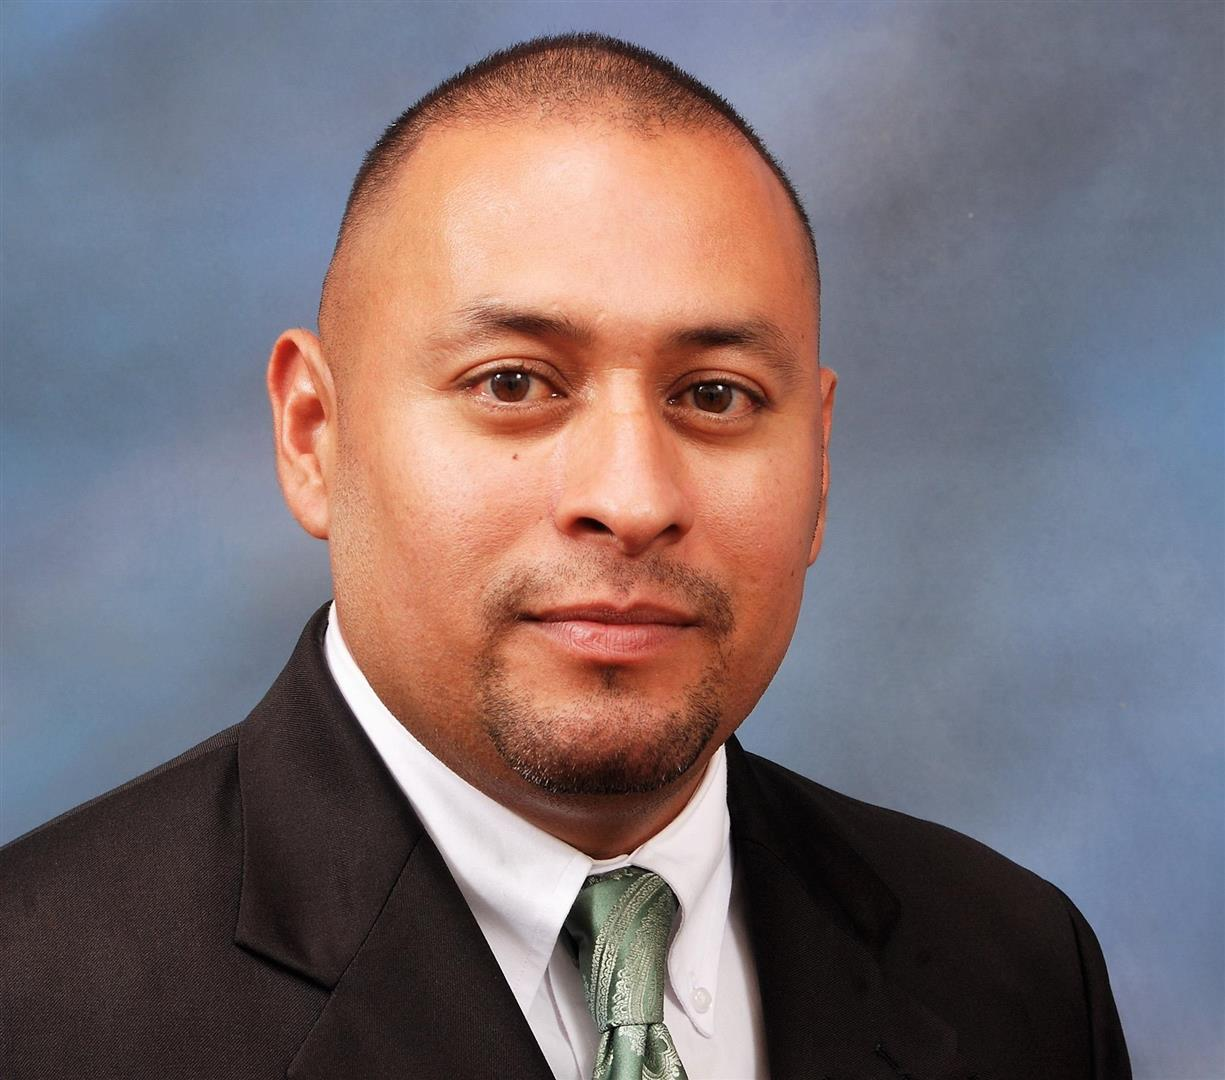 Nelson undefined Hernandez